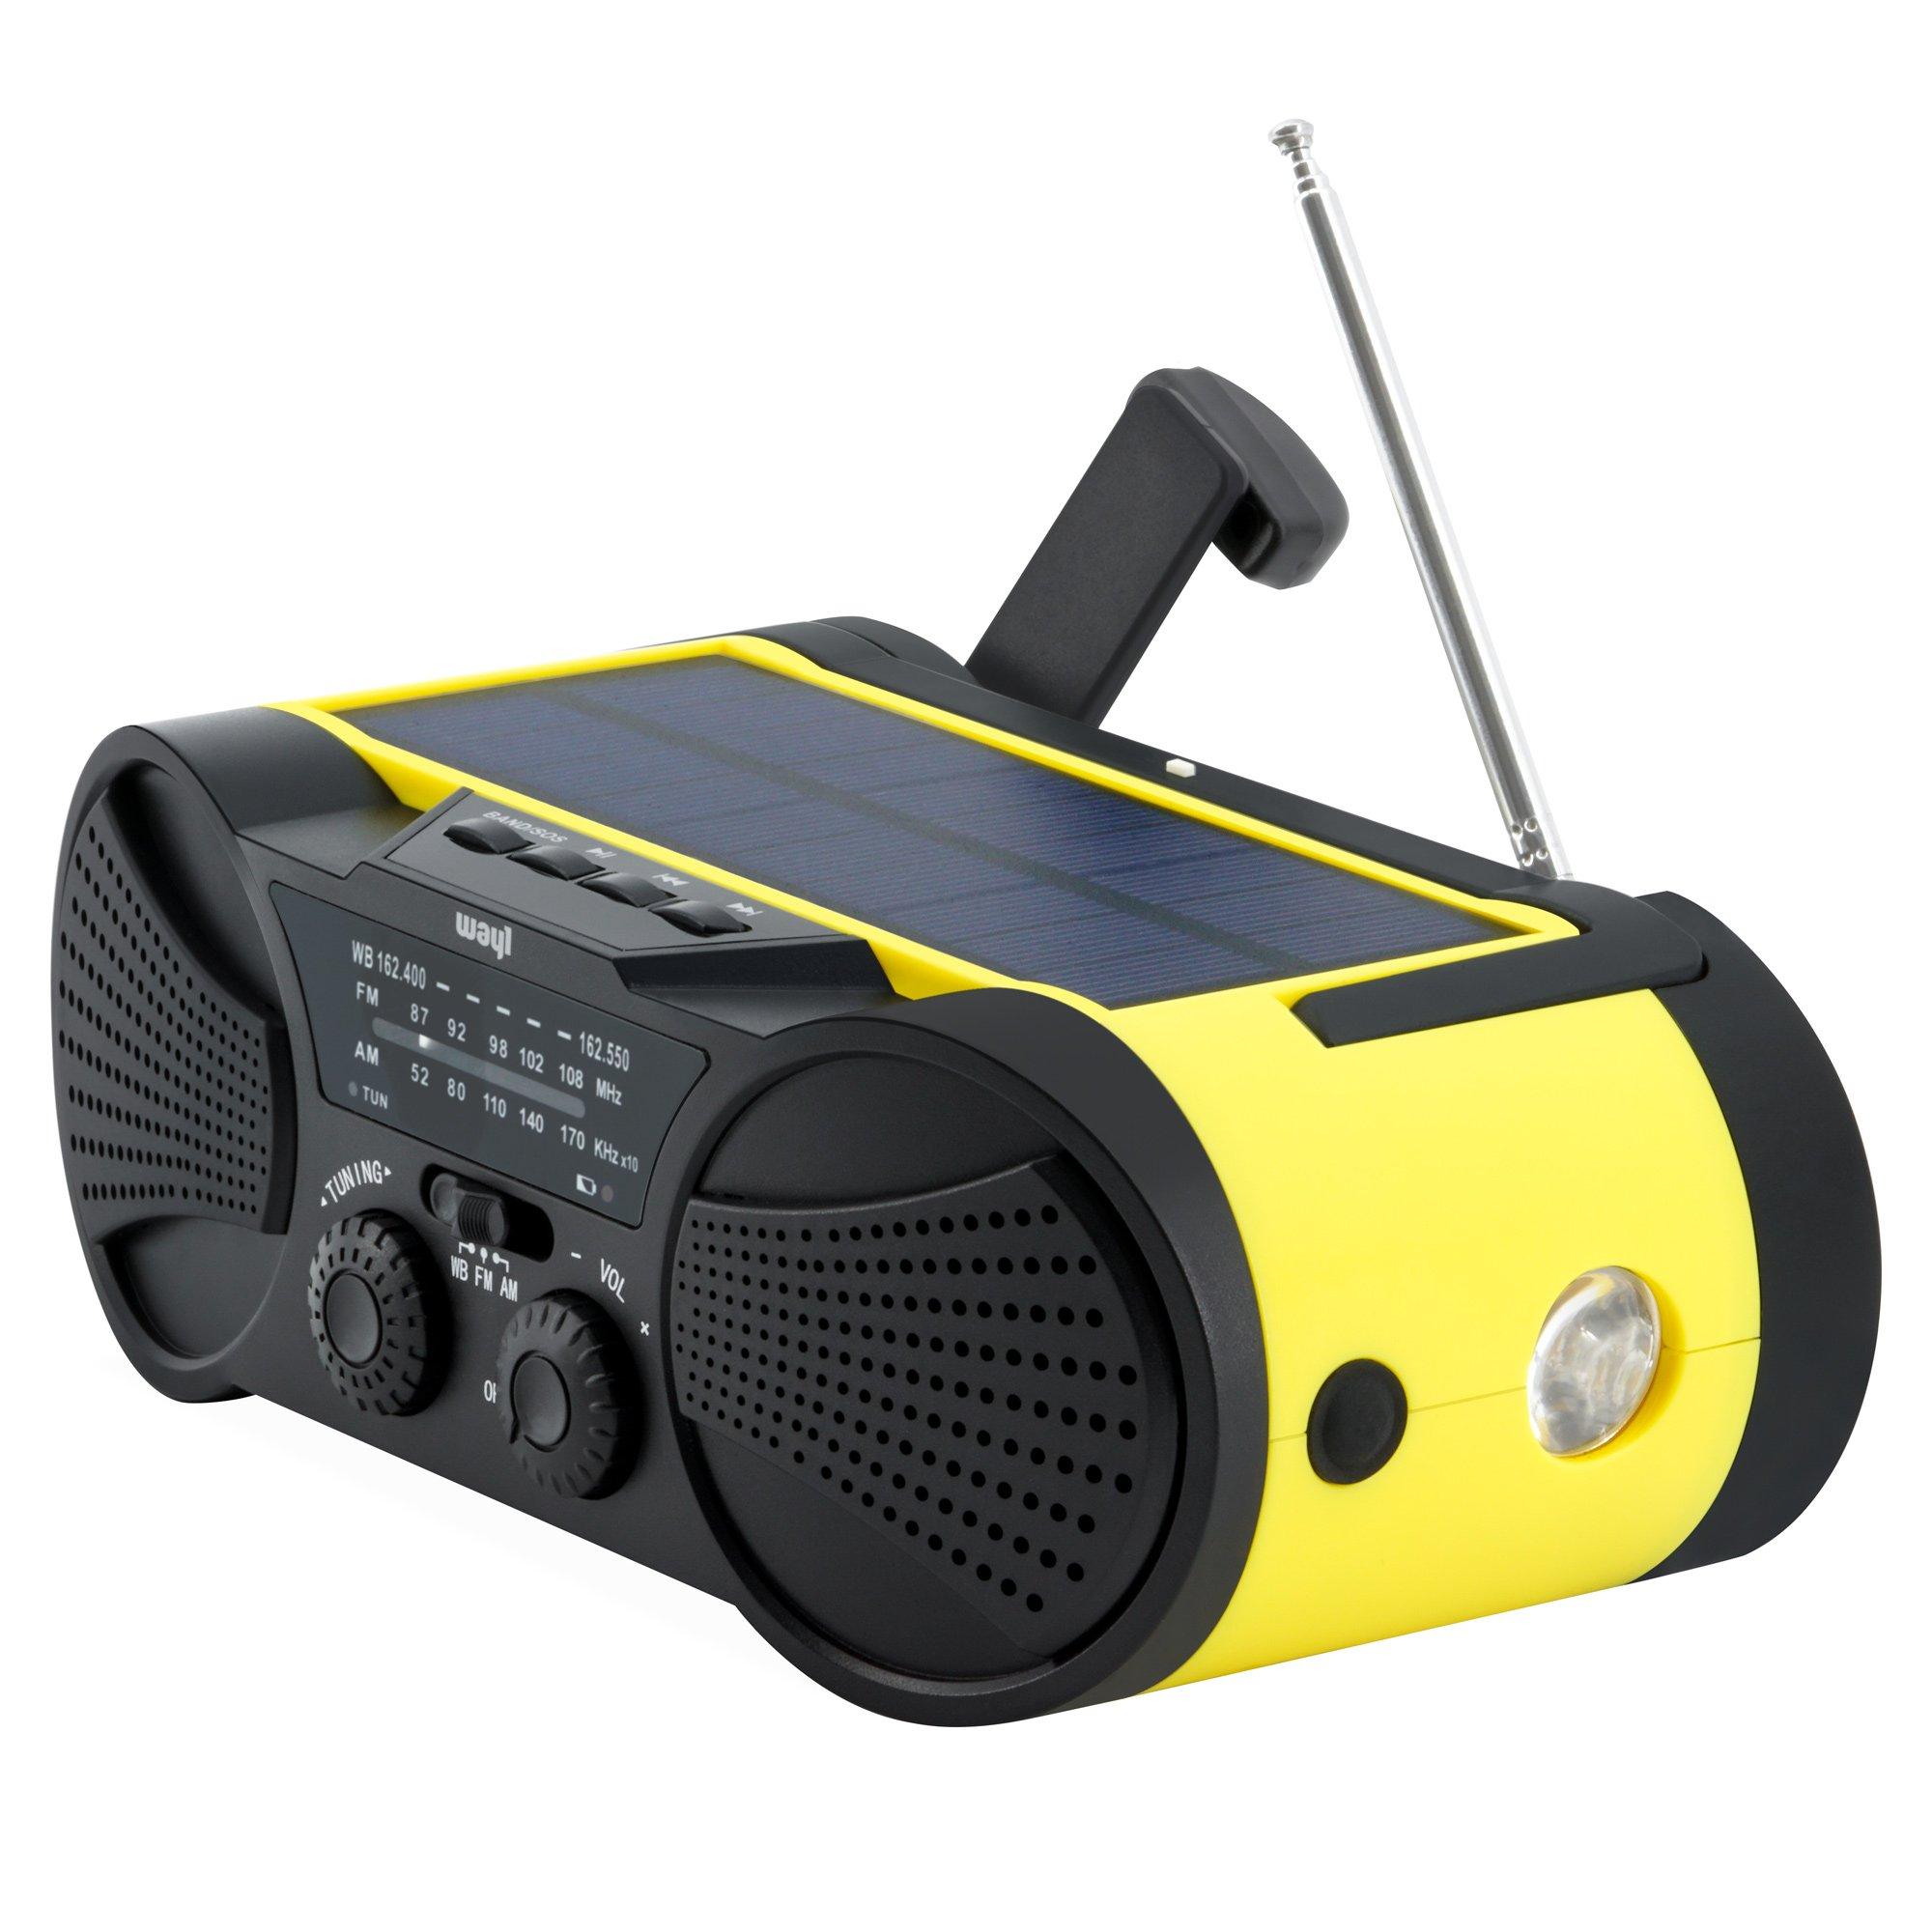 Emergency Weather Radio 4000mAh - Portable, Solar Powered, Hand Crank, AM FM NOAA Weather Stations, USB Cell Phone Charger, SOS Alarm, LED Flashlight & Reading Light Radio - Buzz4000